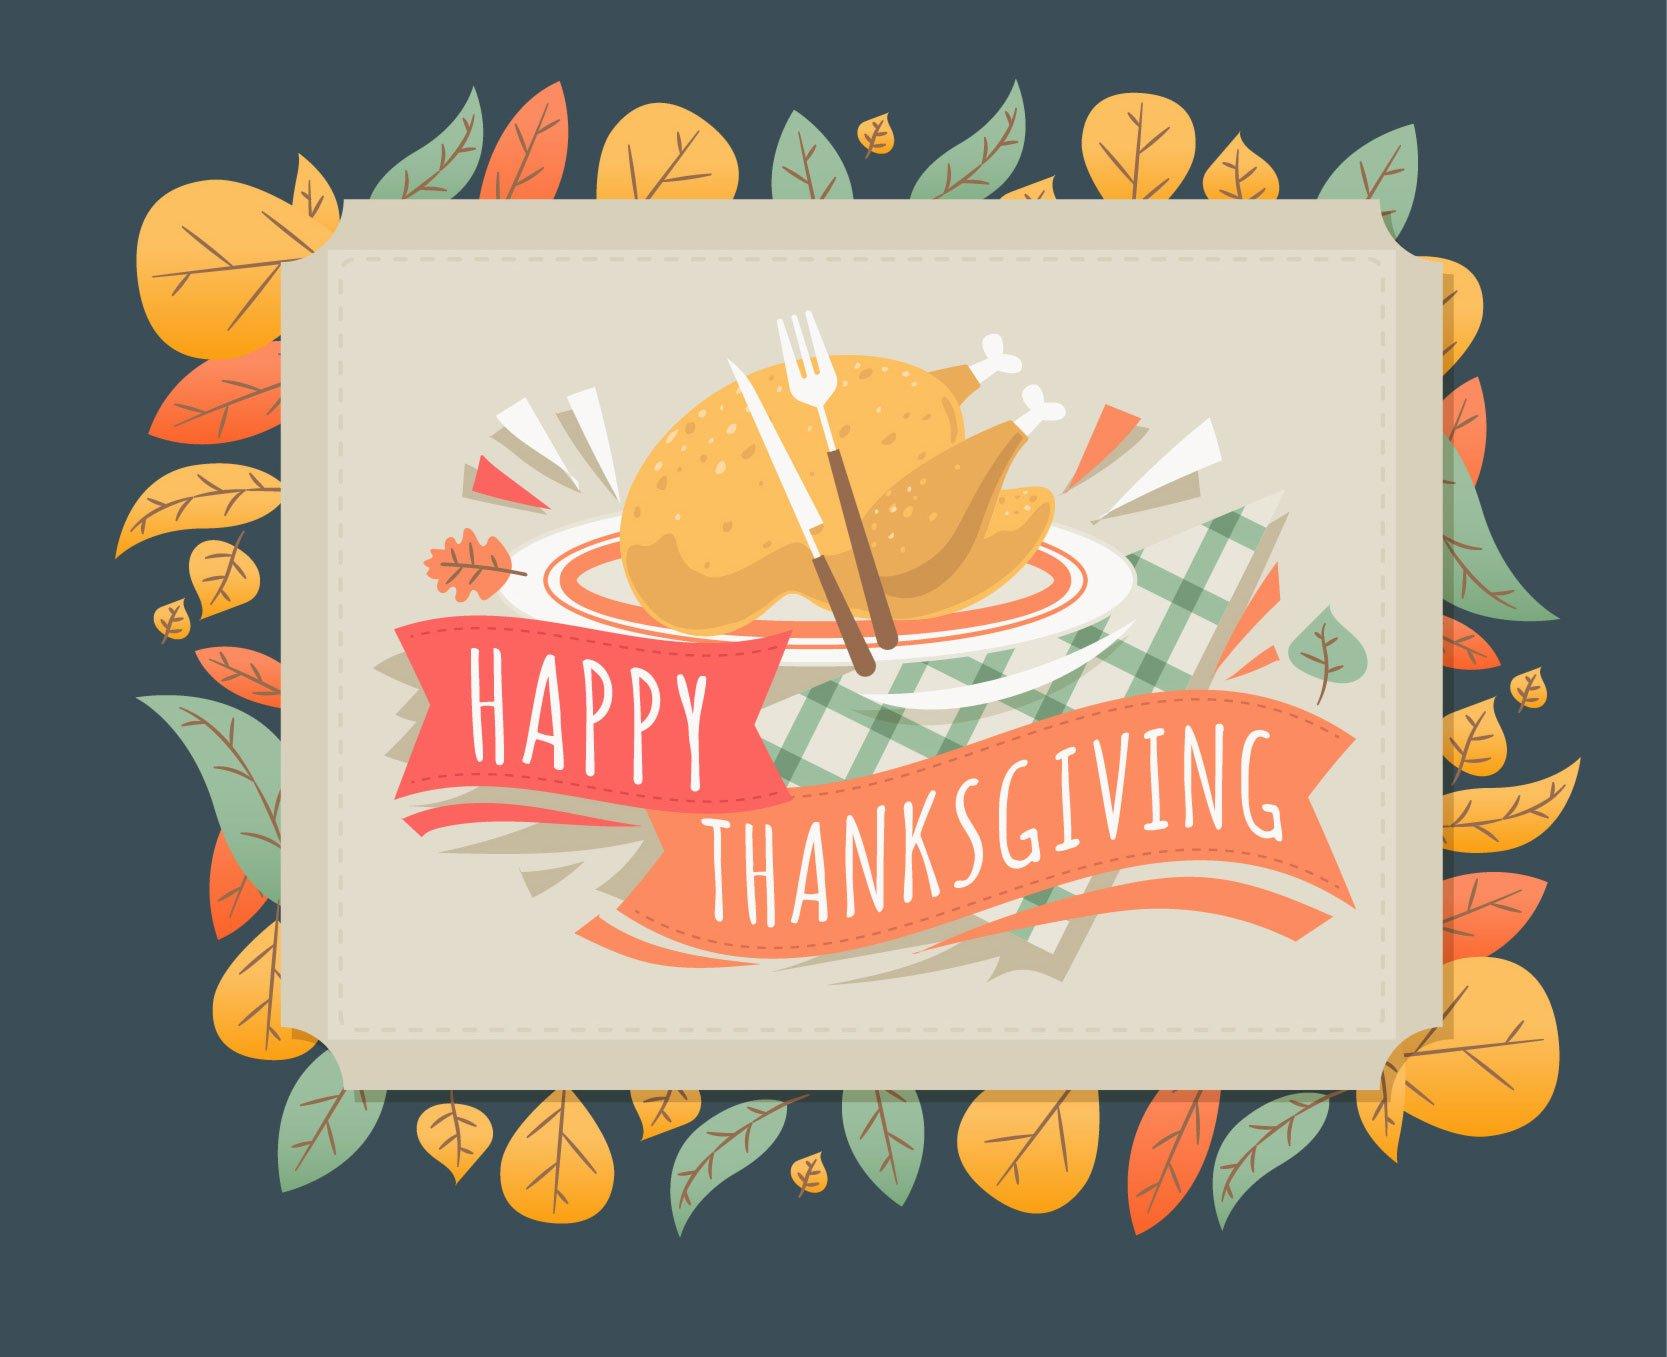 Happy Thanksgiving 2016 Advance Orthodontics